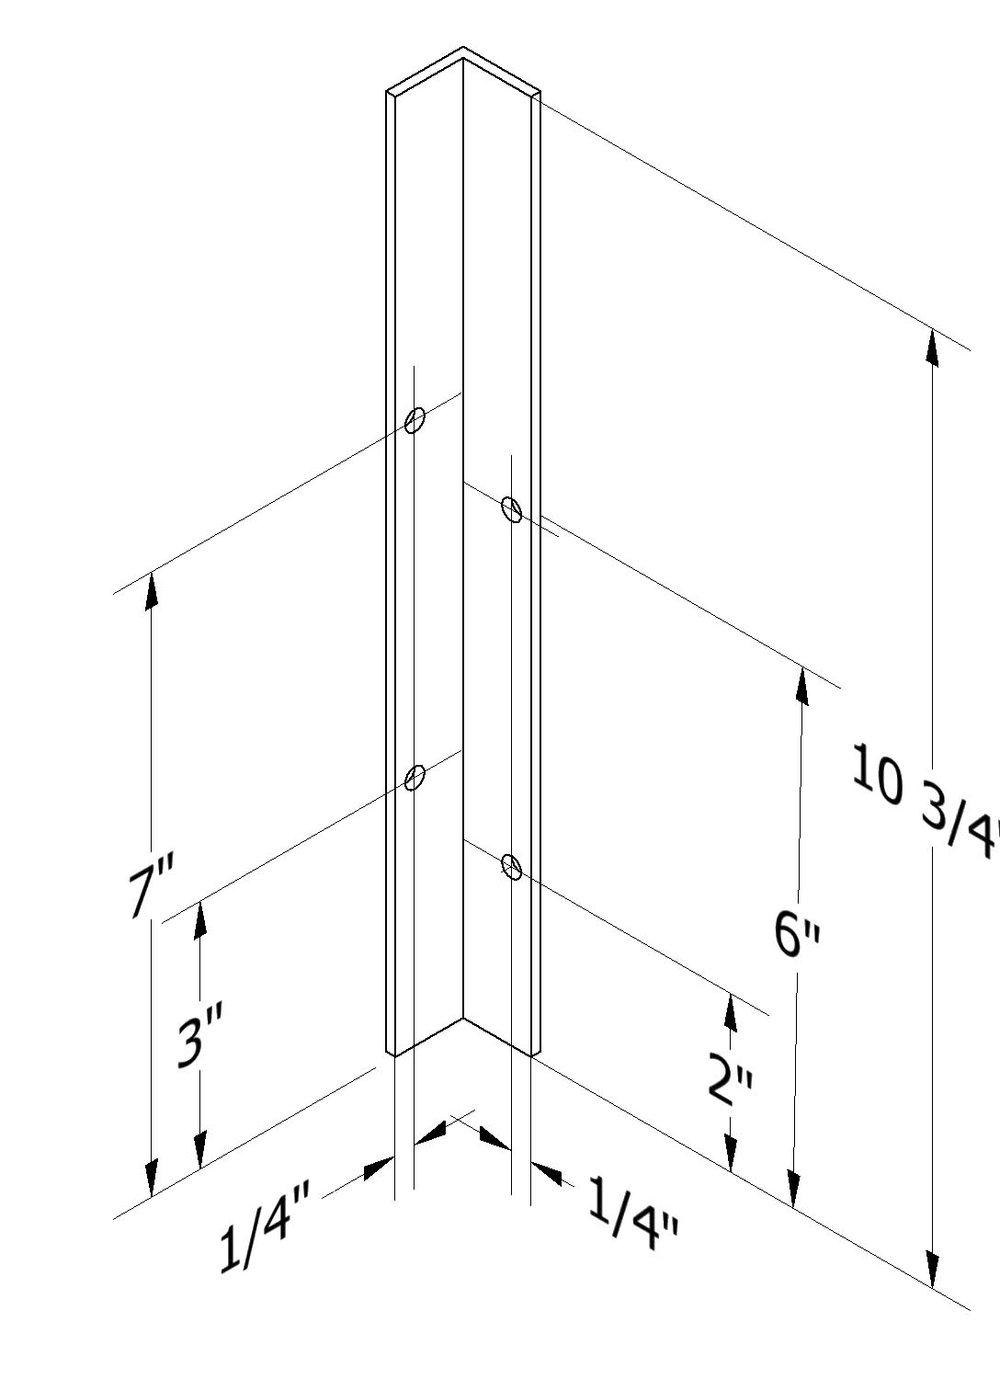 downdraft corner drawing.jpg